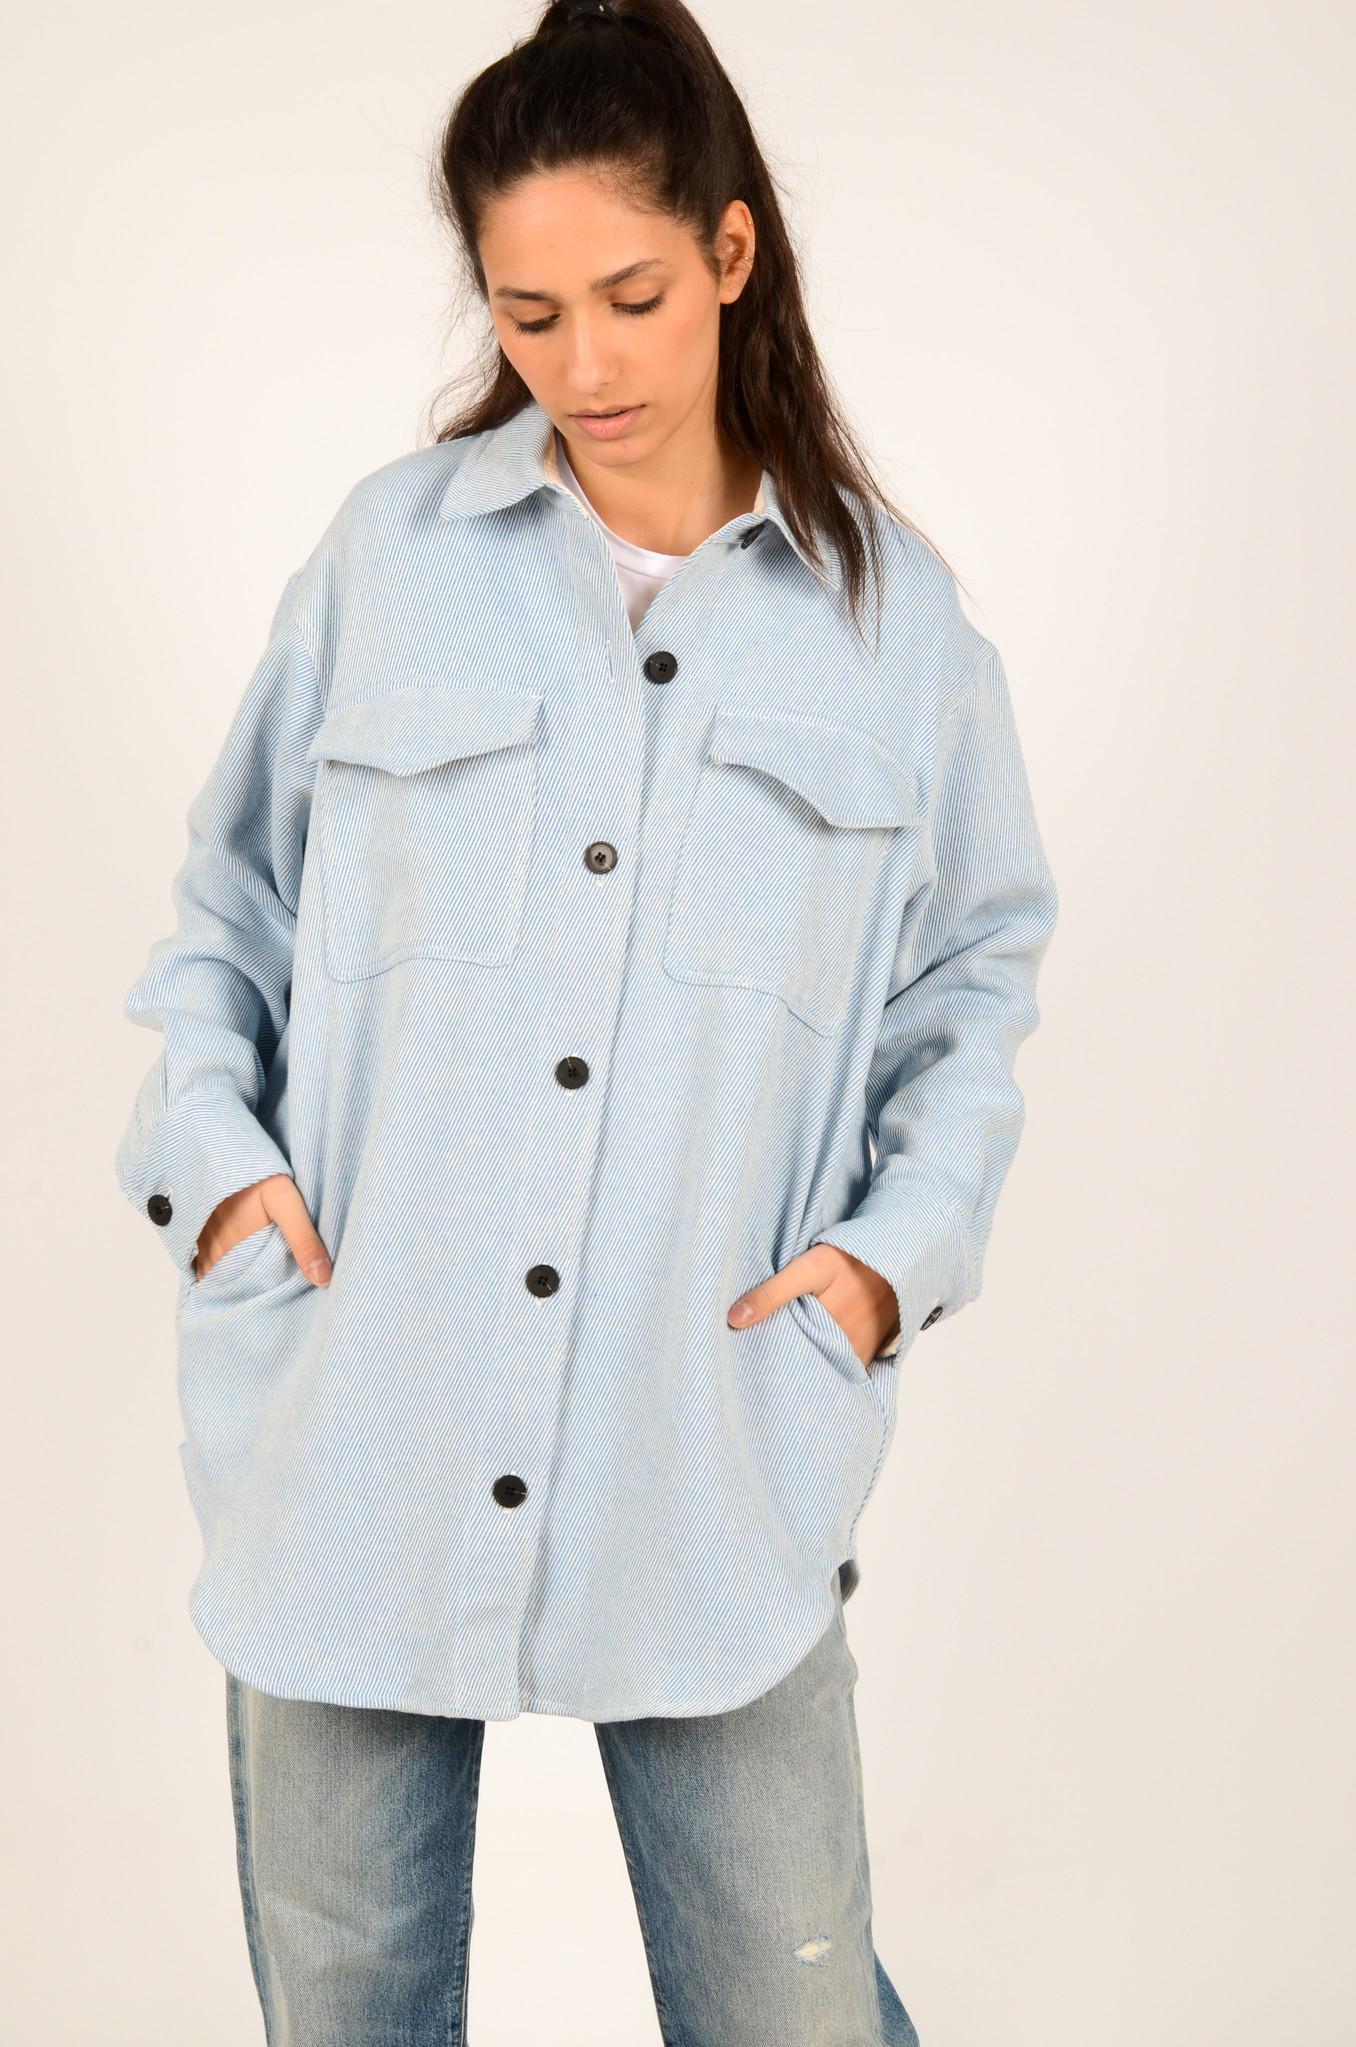 PALERMO SHIRT COAT IN DUSTY BLUE-2